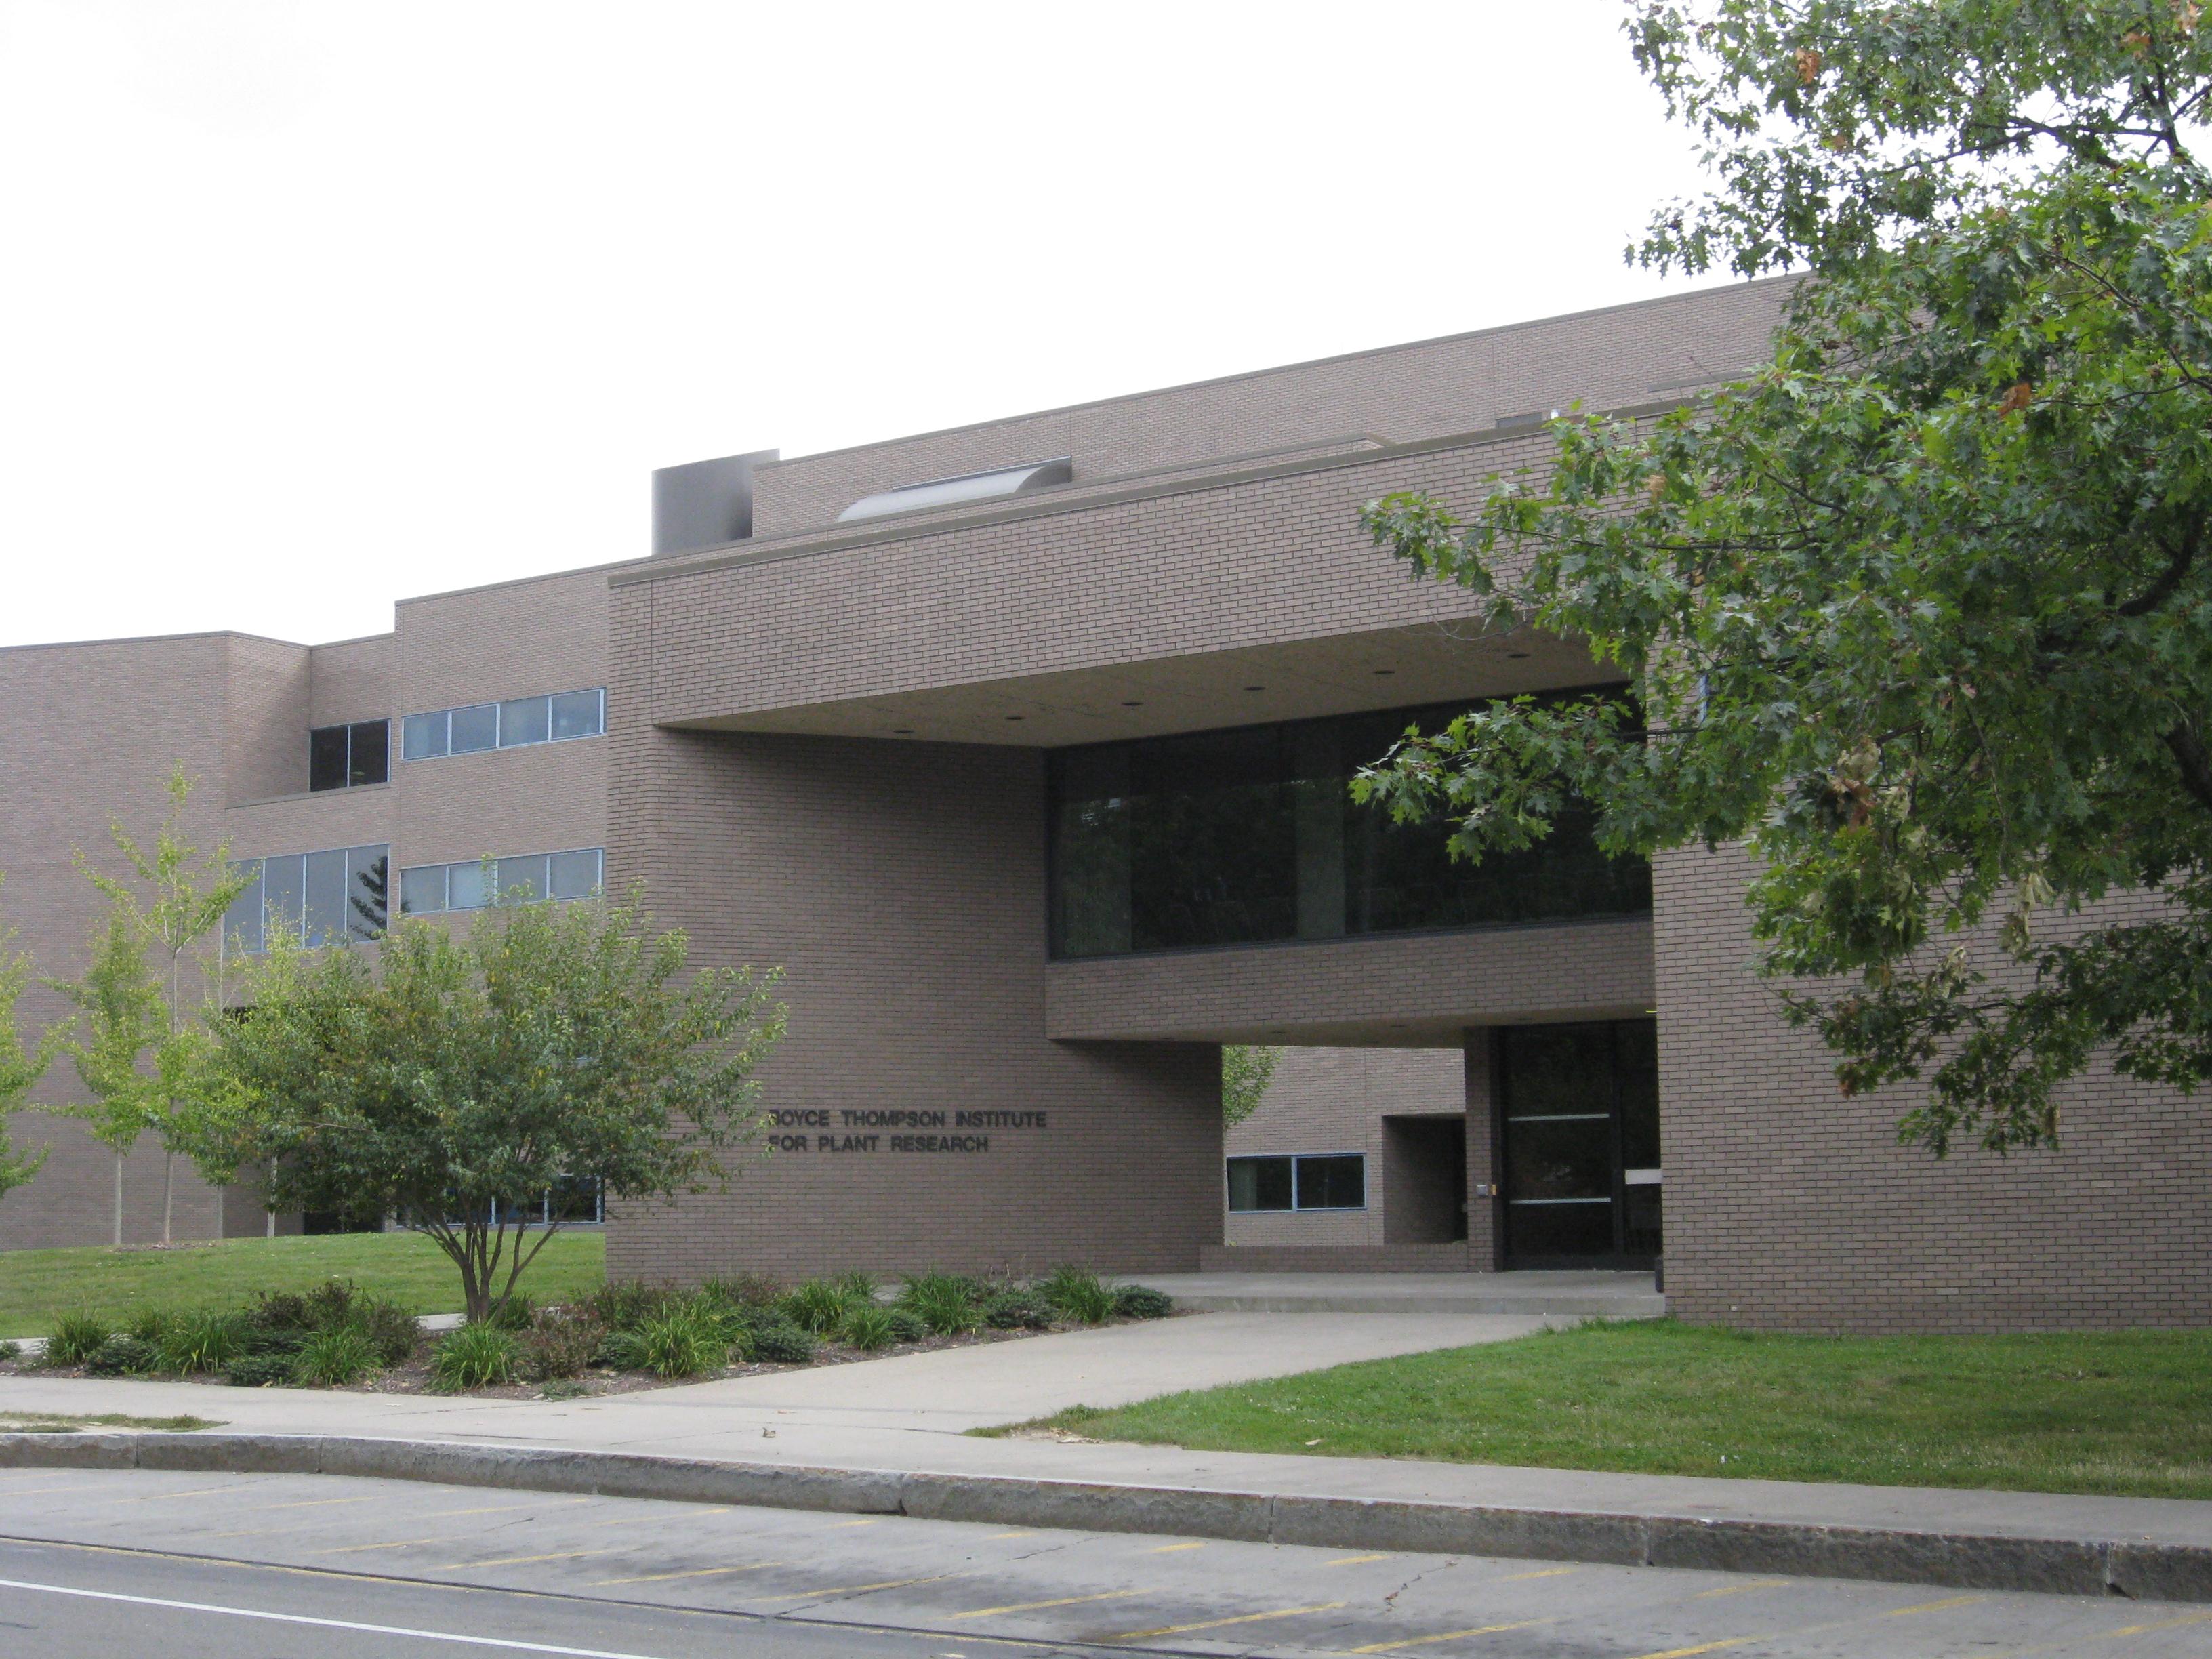 Boyce Thompson Institute - Wikipedia